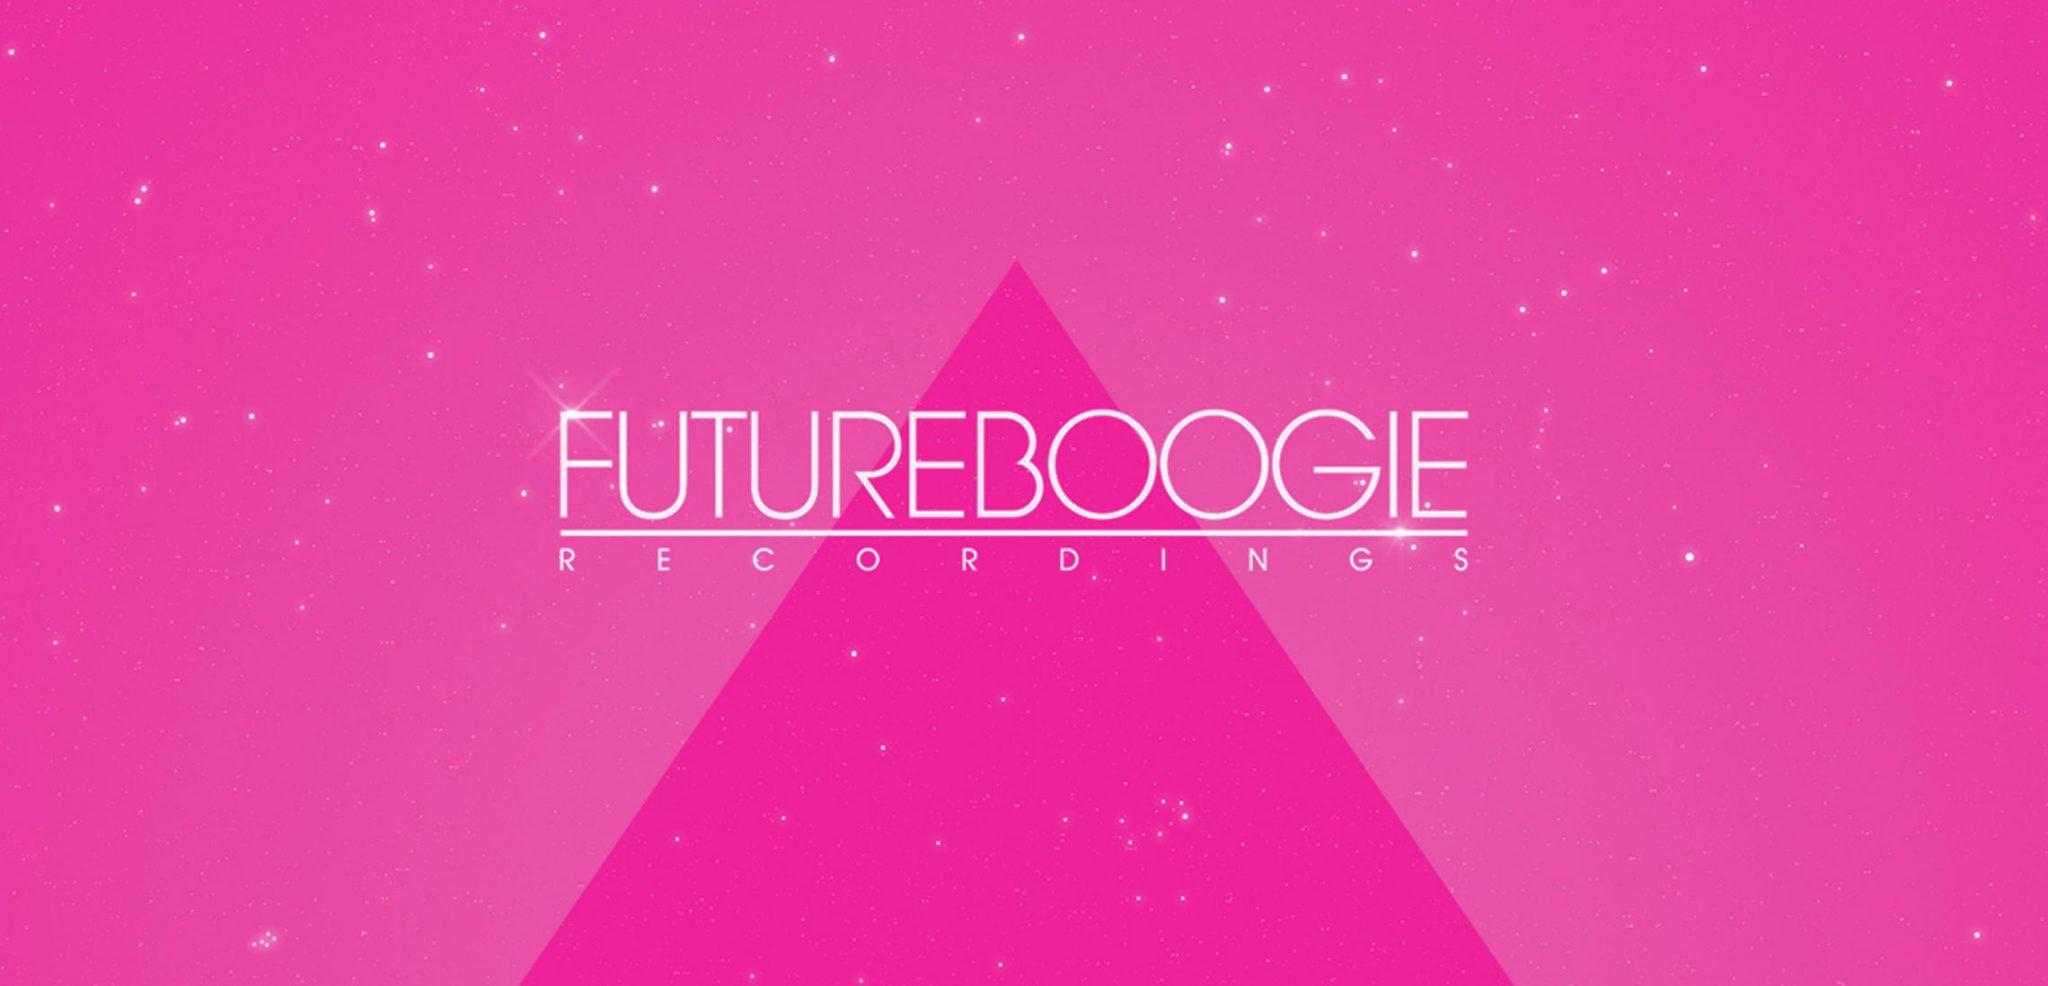 Futureboogie Recordings - SUMMER RIOT III hero